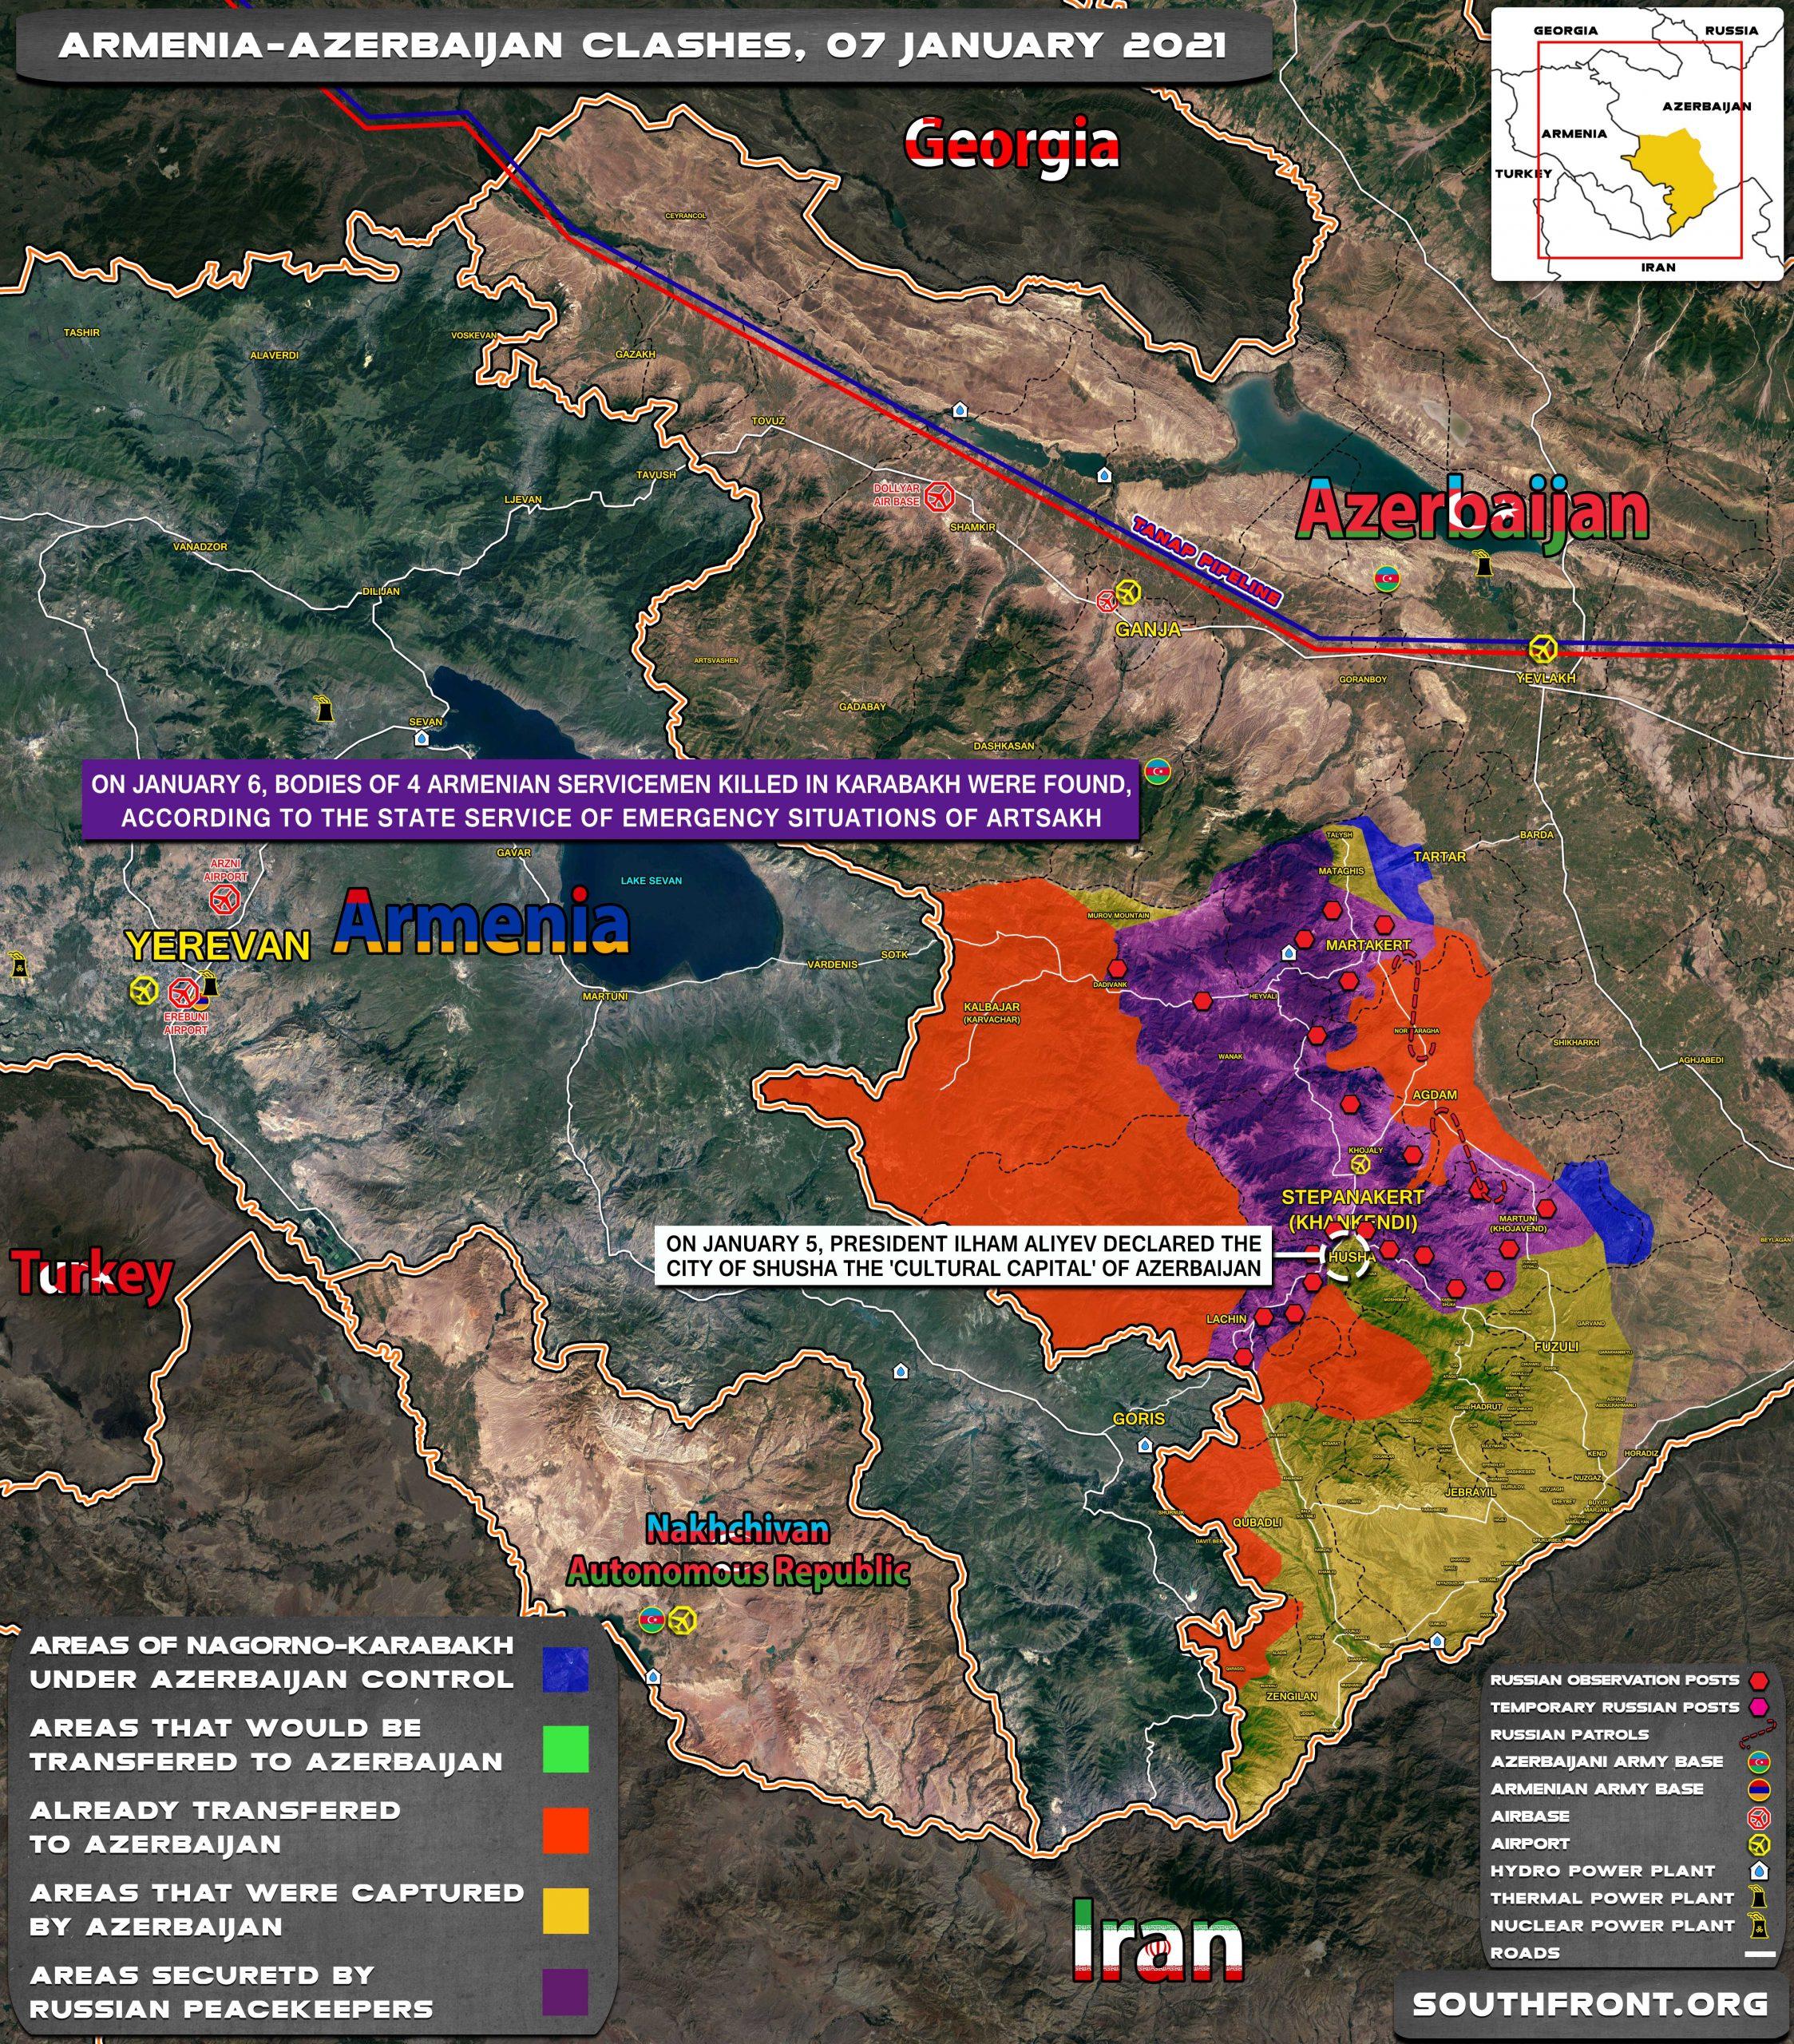 Azerbaijan President Warns Armenian Officials Against Visiting Artsakh Freely